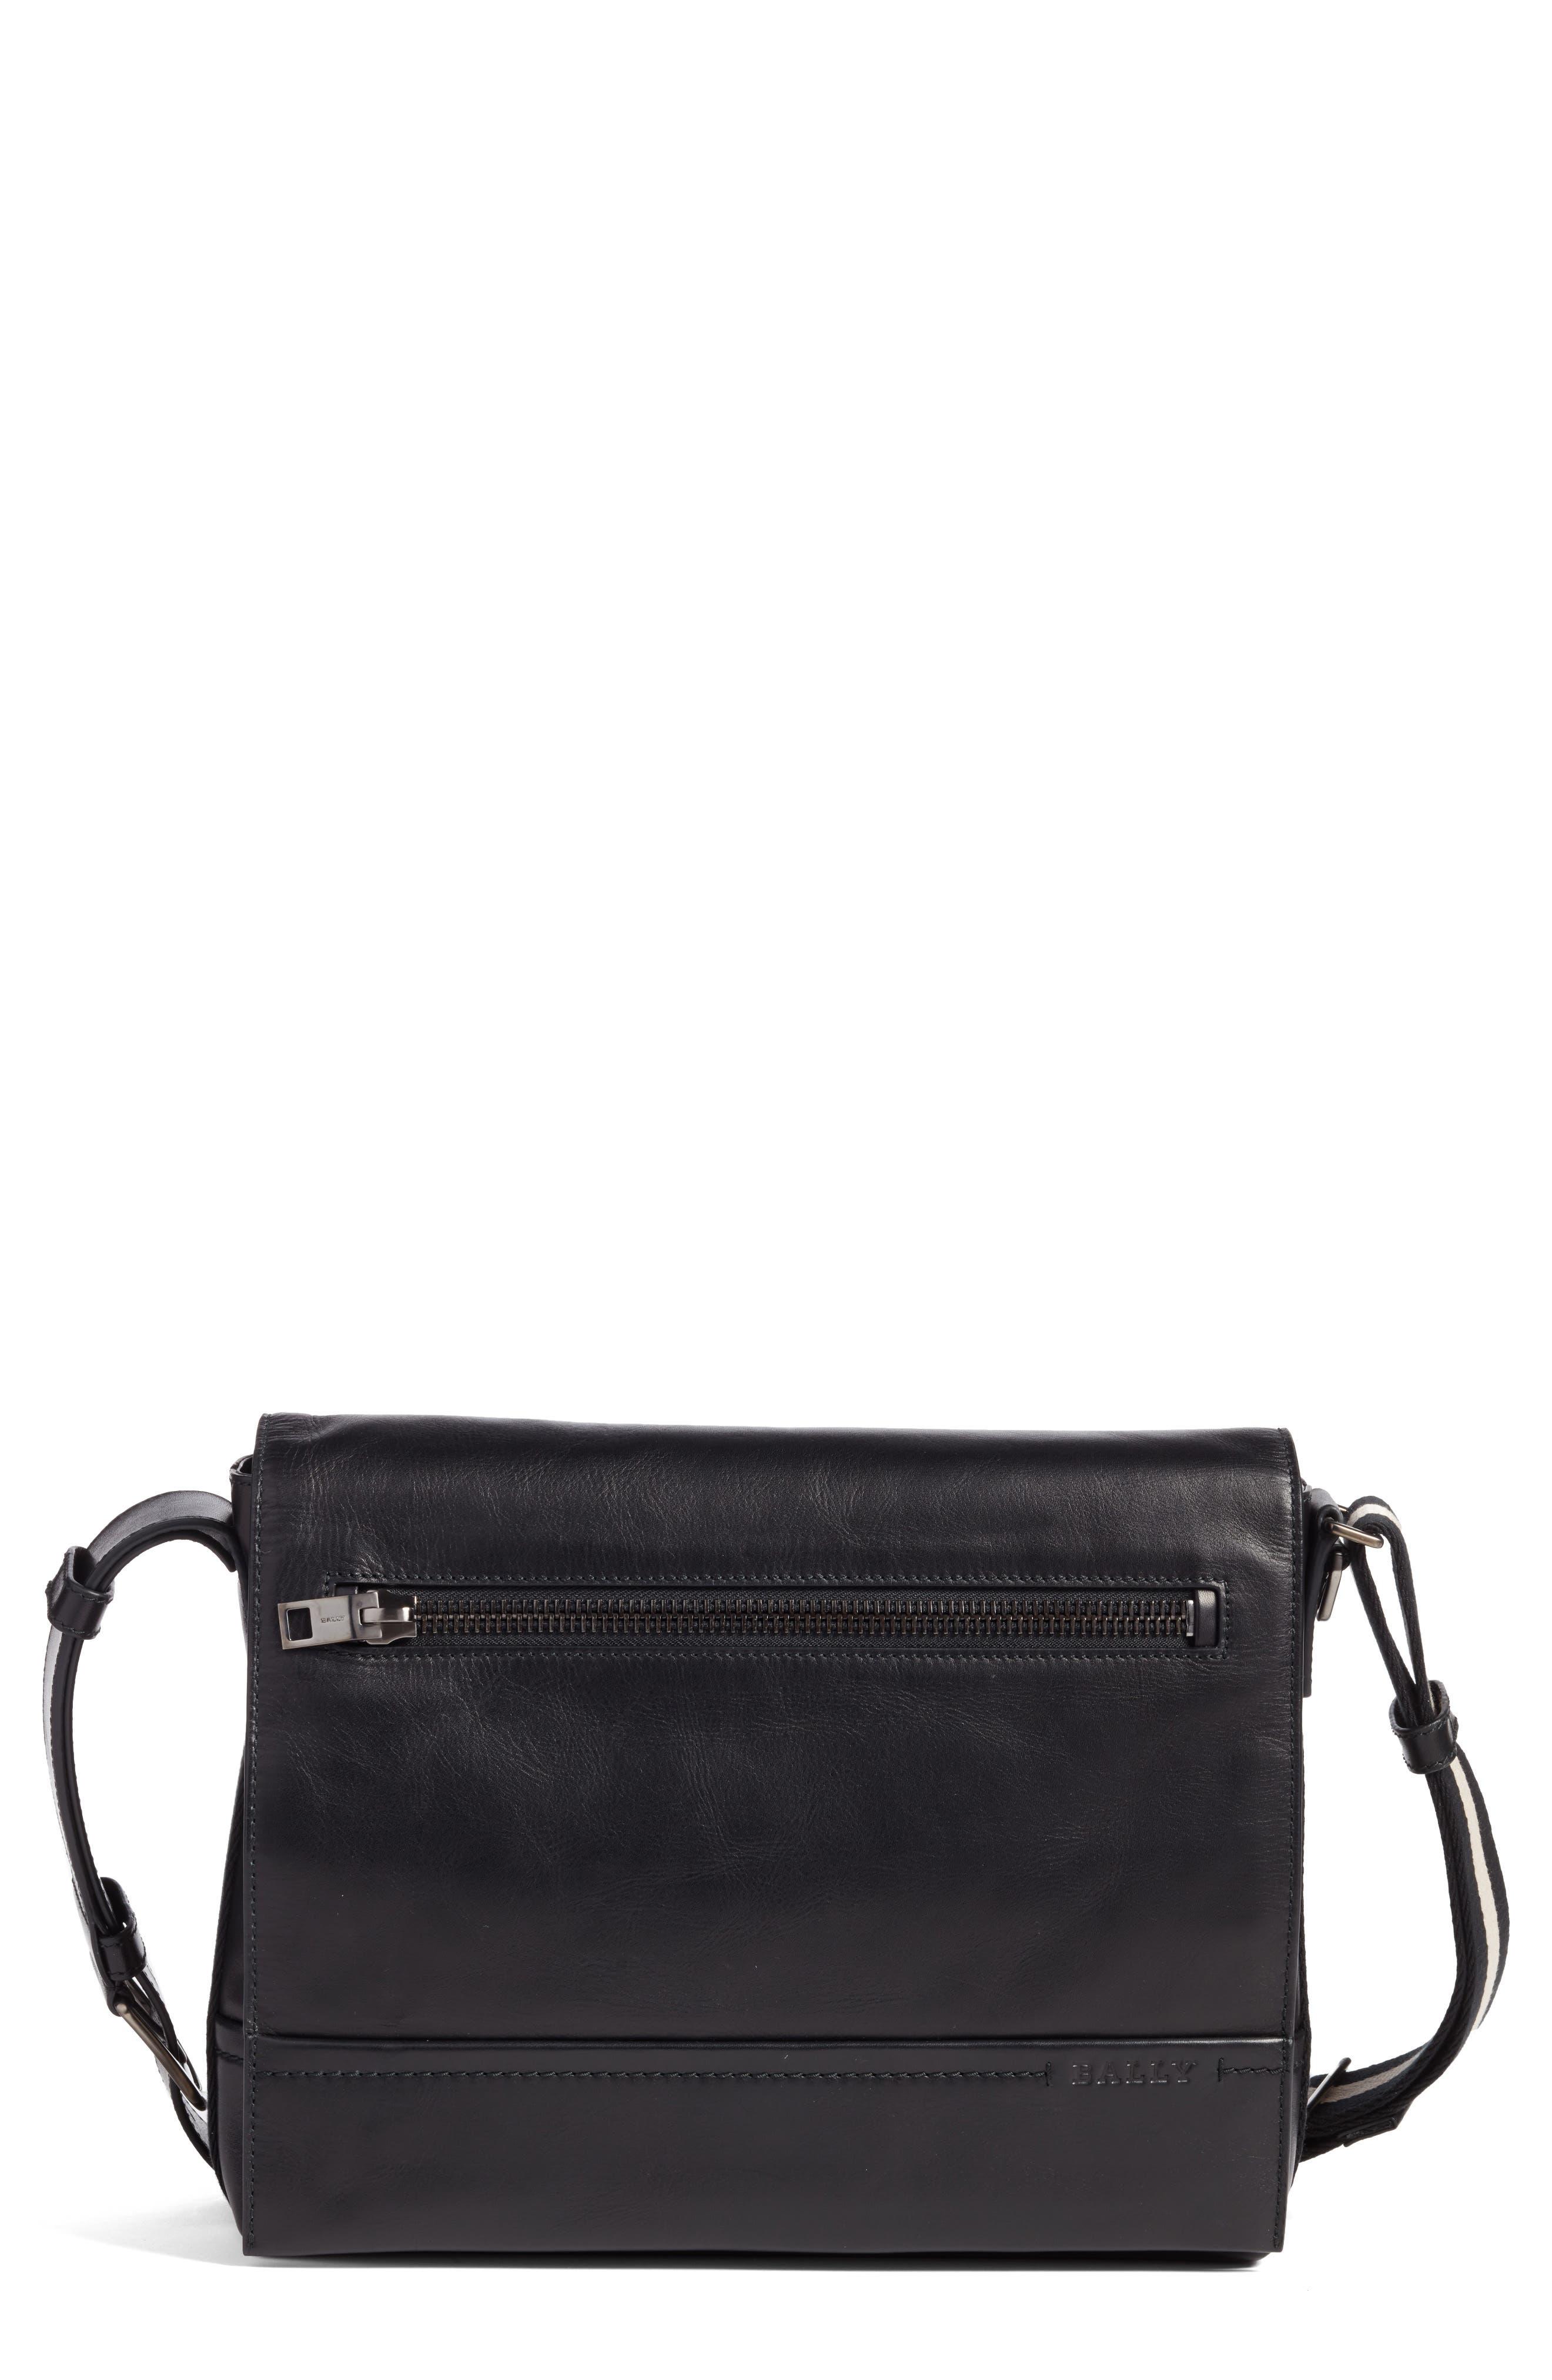 Alternate Image 1 Selected - Bally Tamrac Leather Messenger Bag